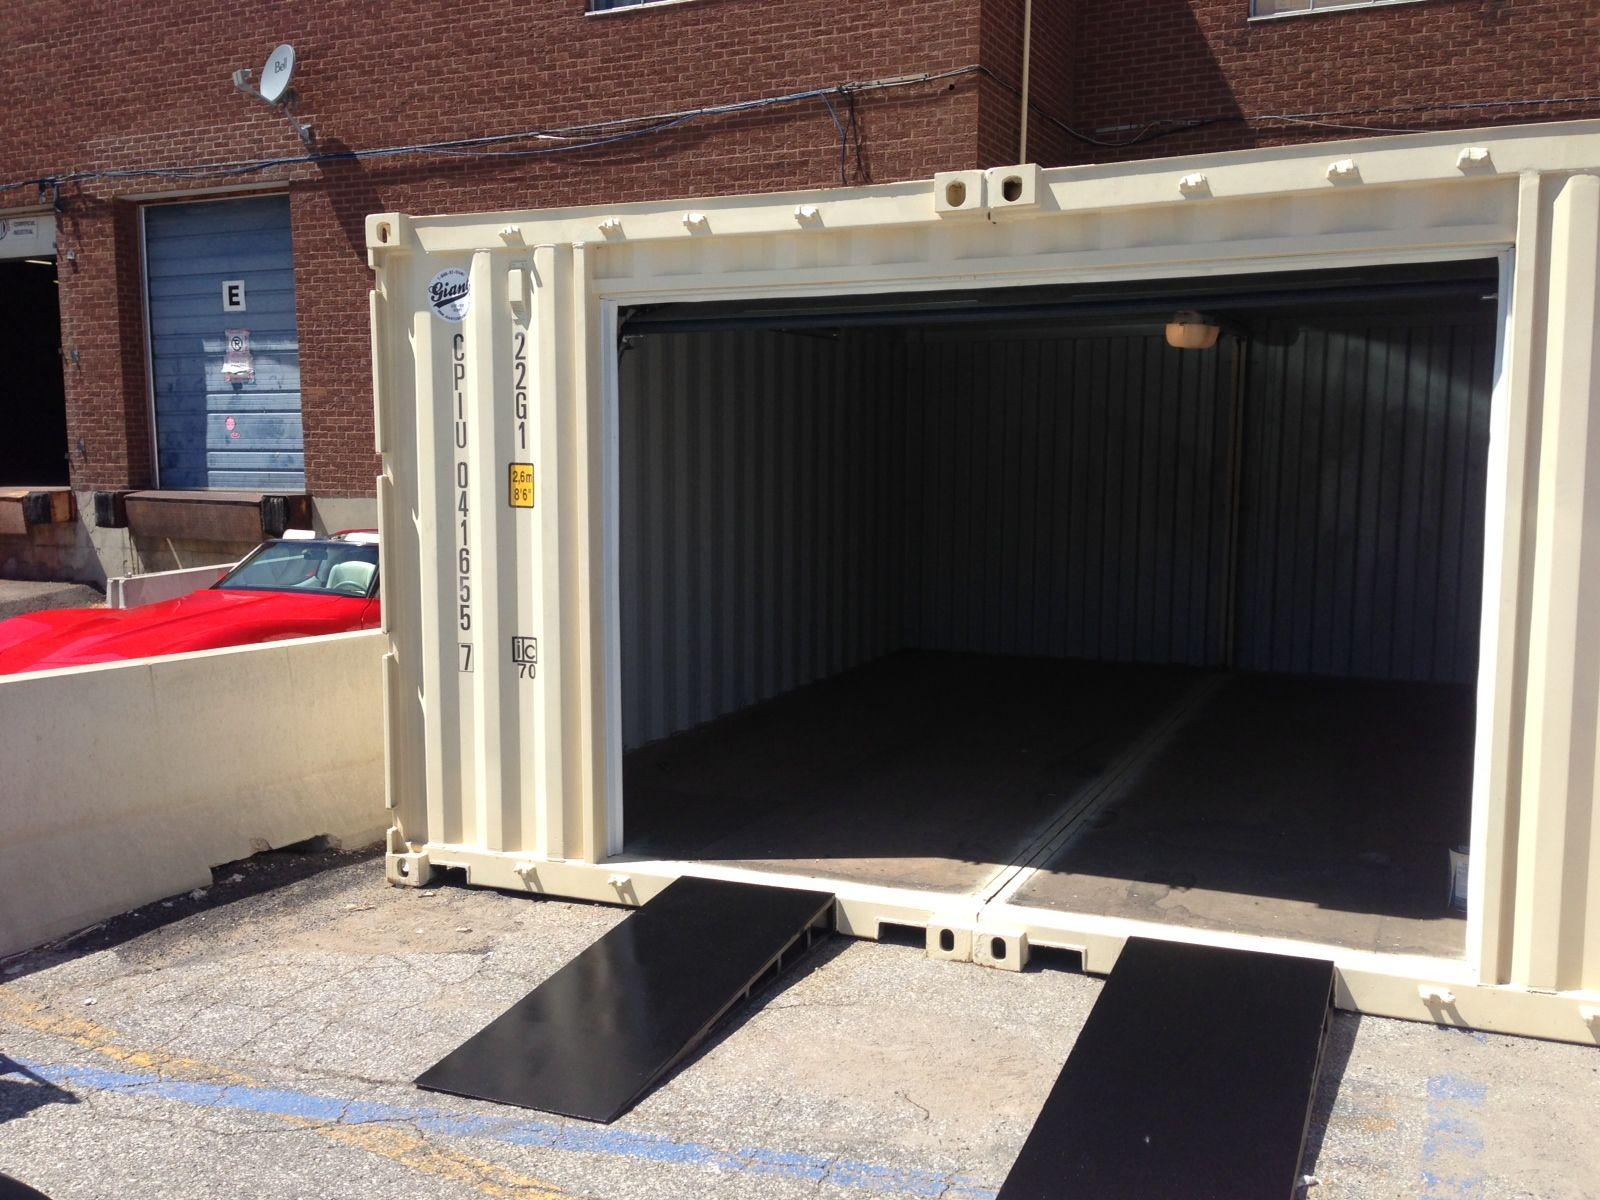 Best Kitchen Gallery: Shipping Container Garage New Used Modified Shipping Containers of Shipping Container Garage Kits on rachelxblog.com